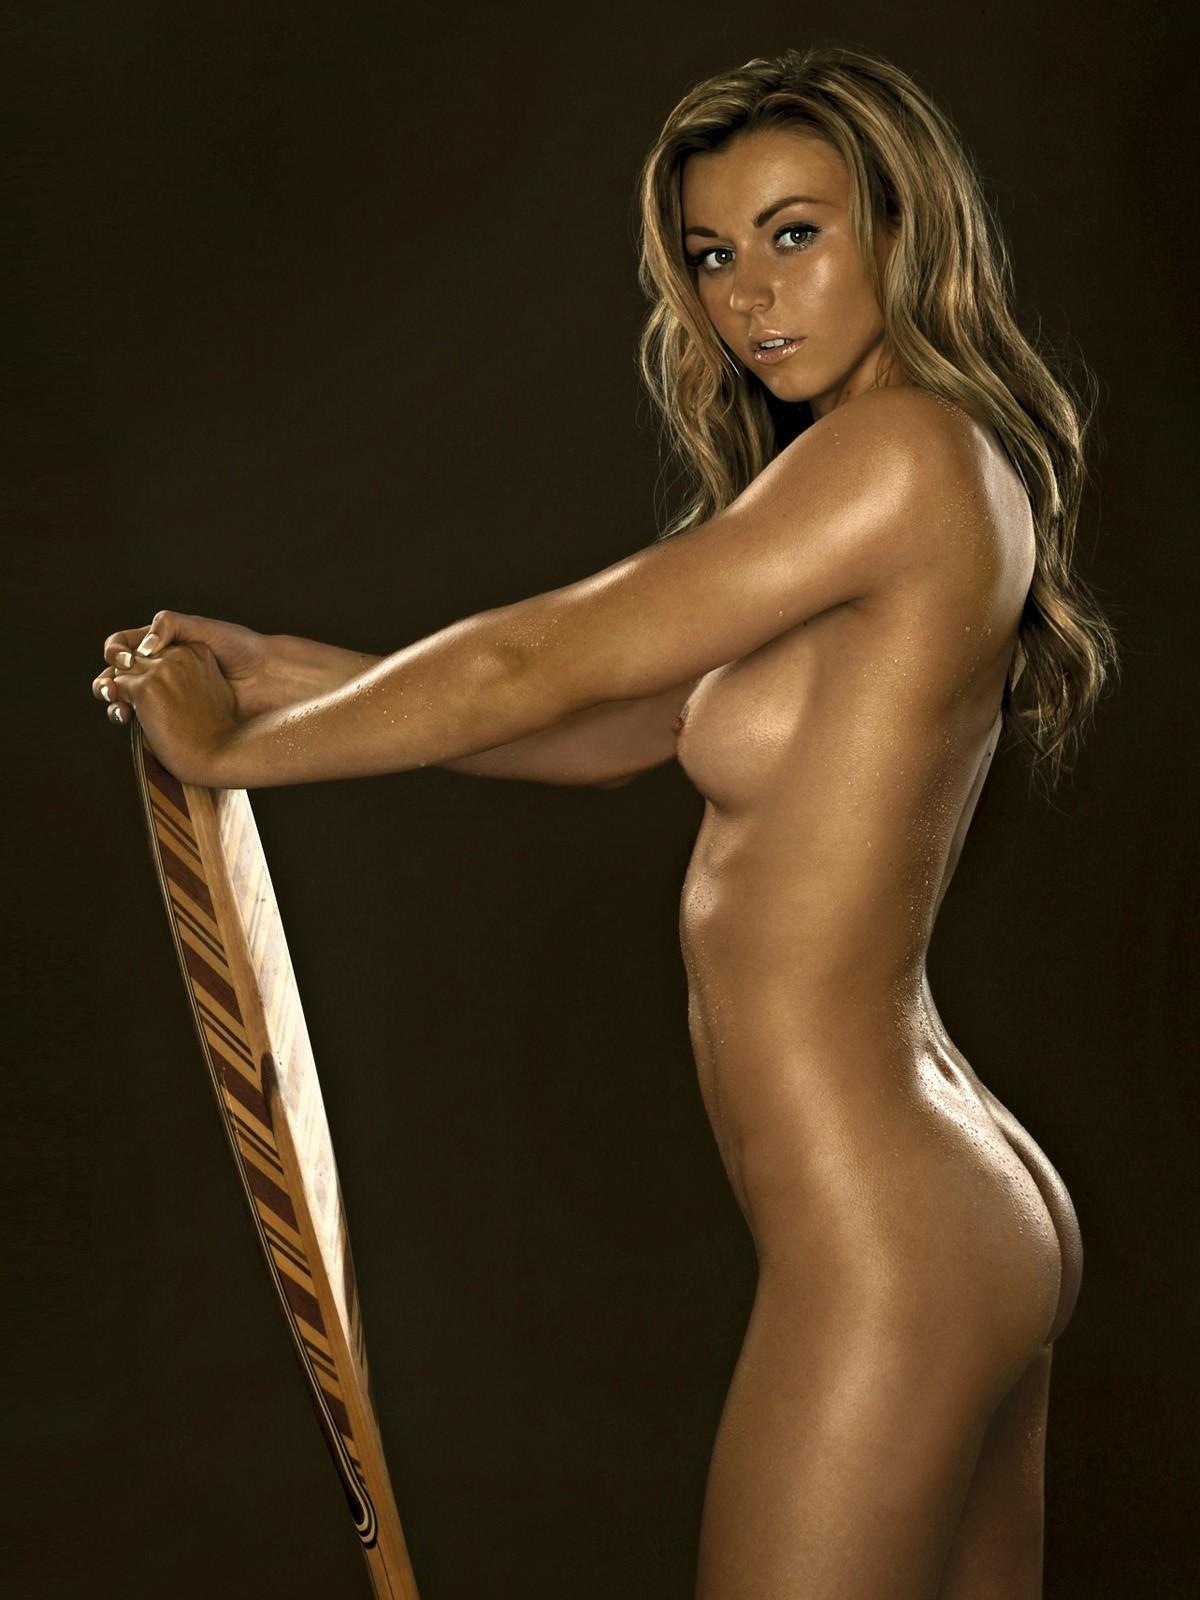 Nicole-Reinhardt-German-Olympians-Nude-For-Playboy-6.jpg